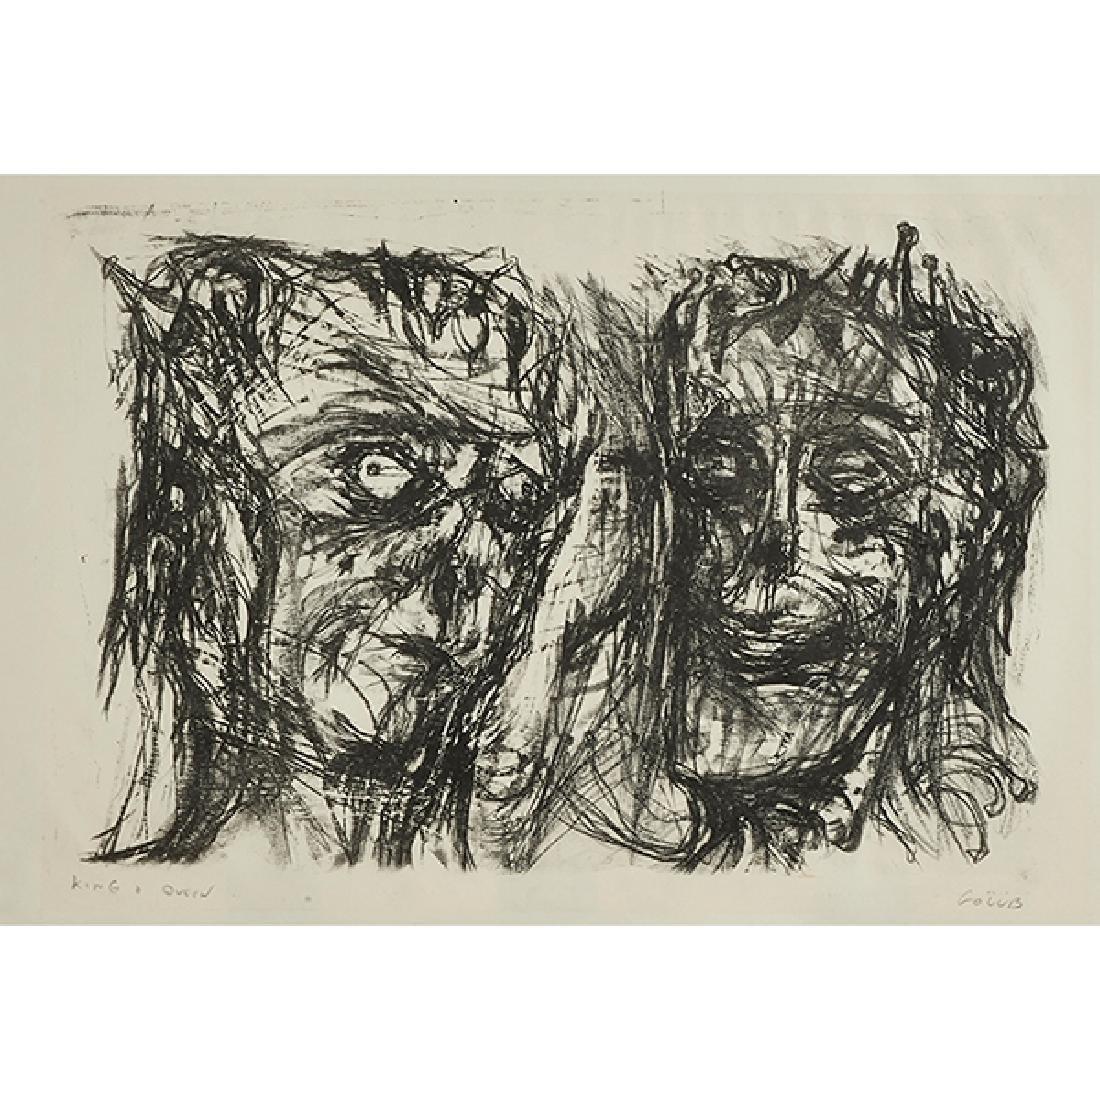 Leon Golub, (American, 1922-2004), King and Queen,